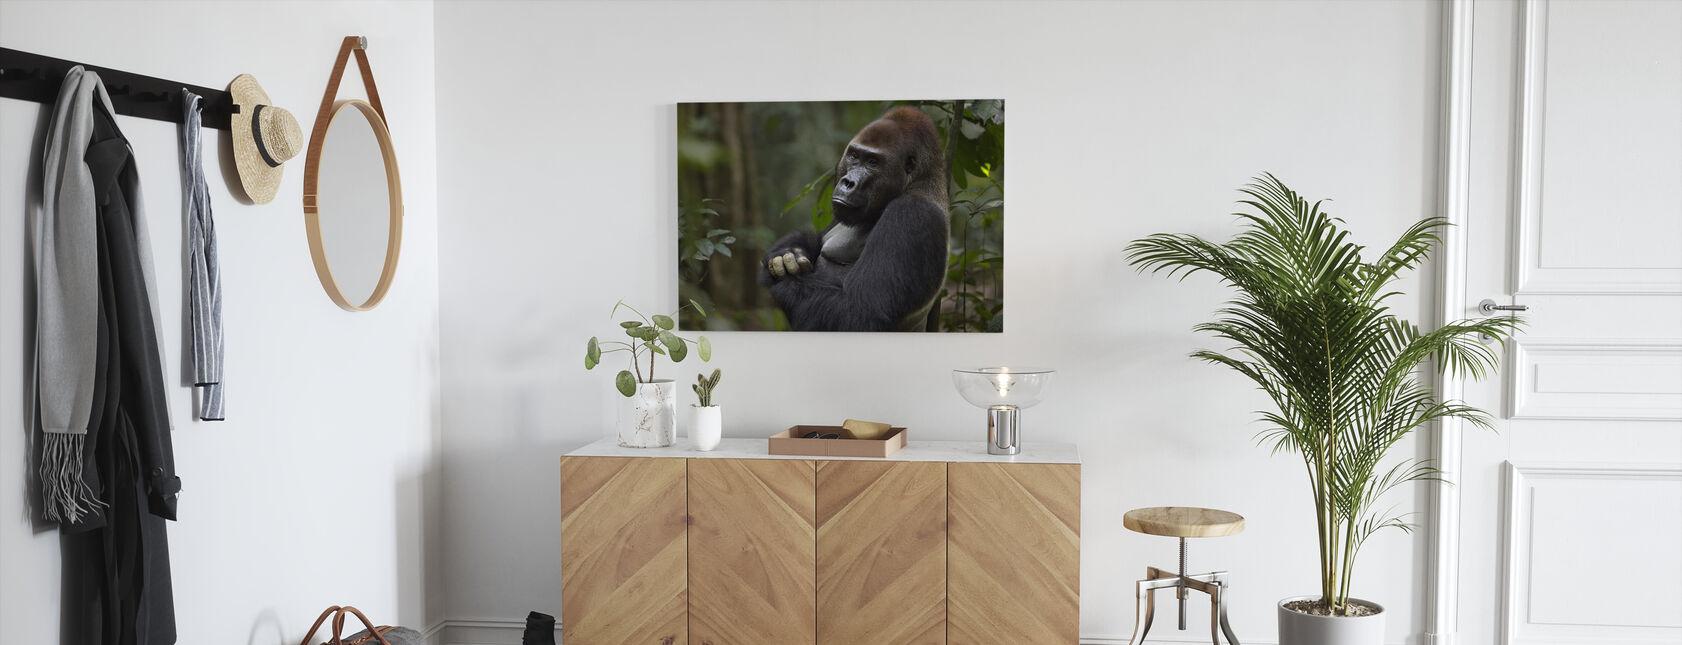 Silverback Portret - Canvas print - Gang